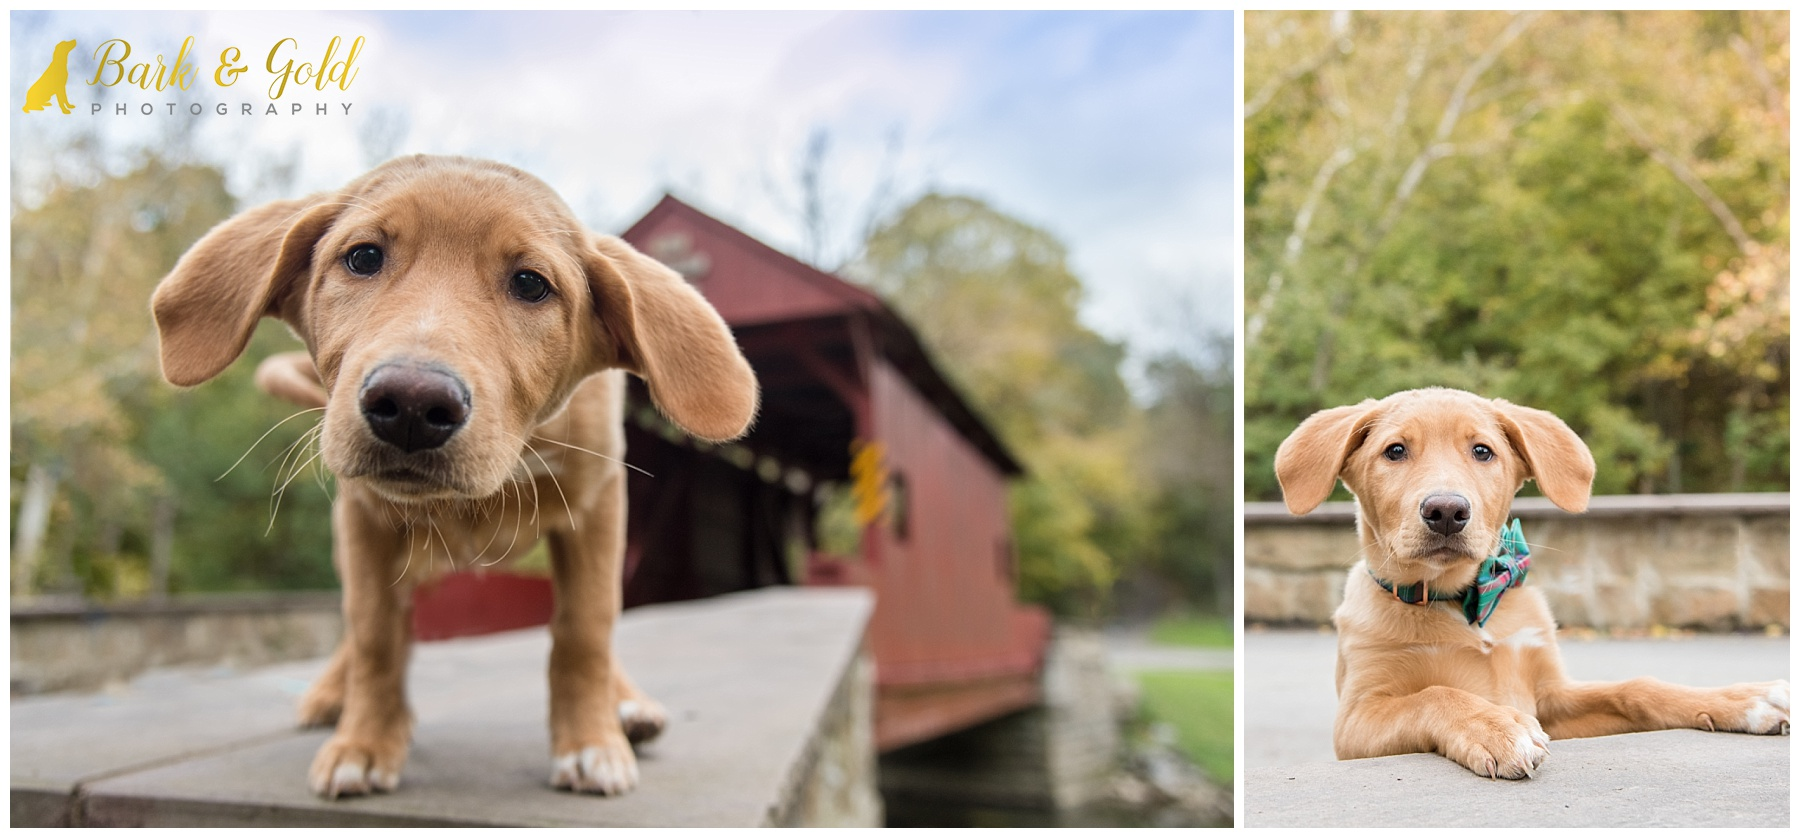 Brown puppy at Mingo Creek Park exploring the covered bridge